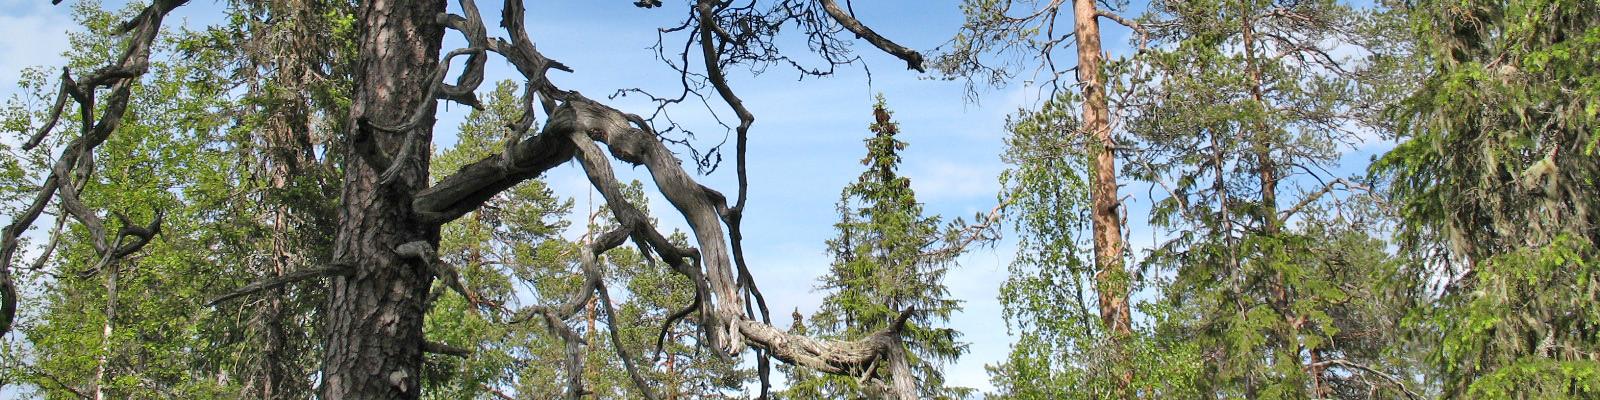 tallnaturskog  (4)